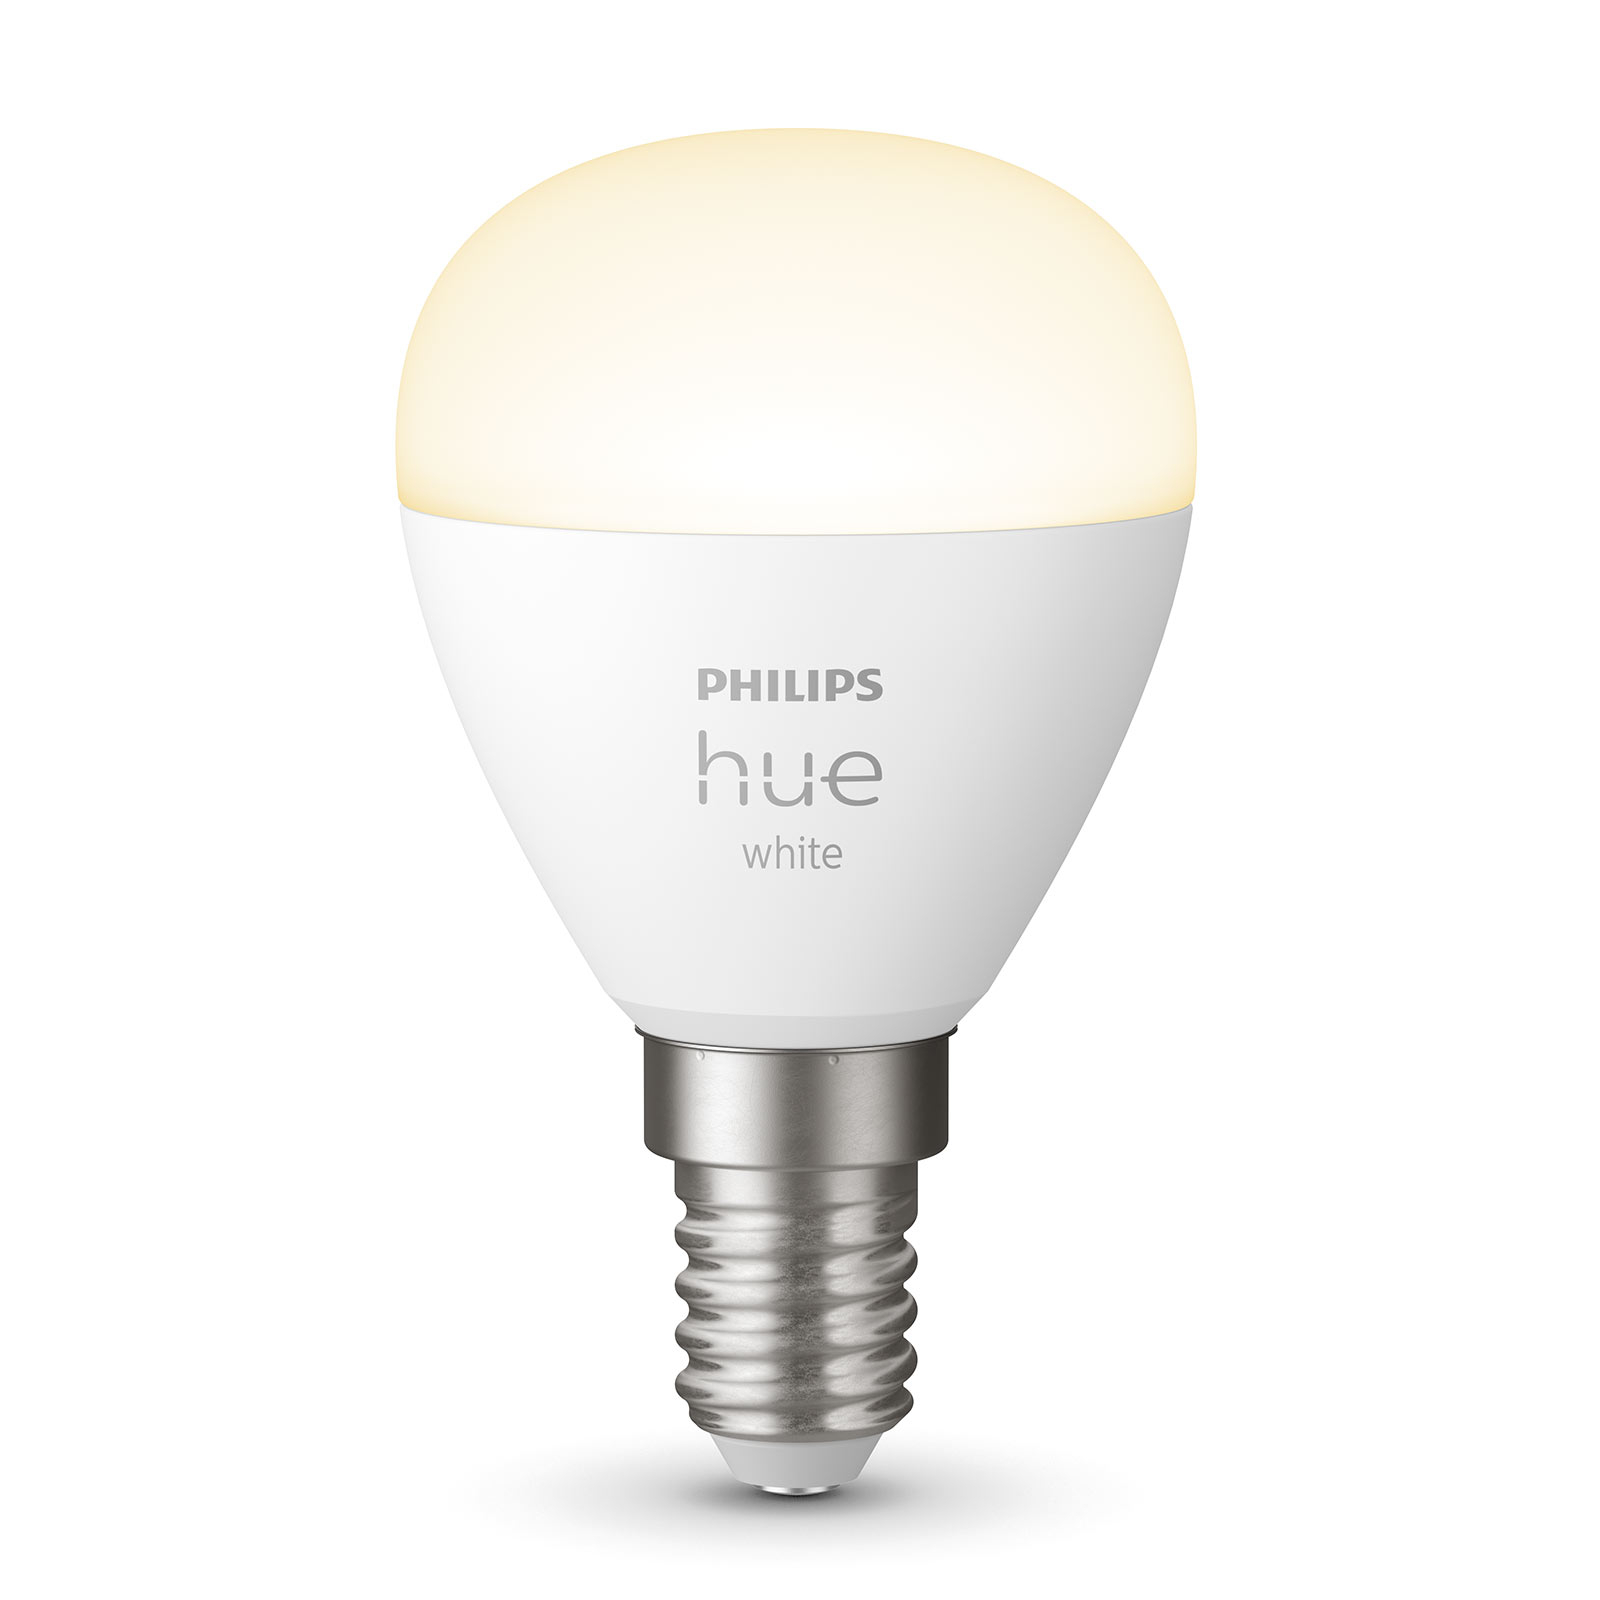 Philips Hue White LED-Tropfenlampe E14 5,7W 2.700K kaufen